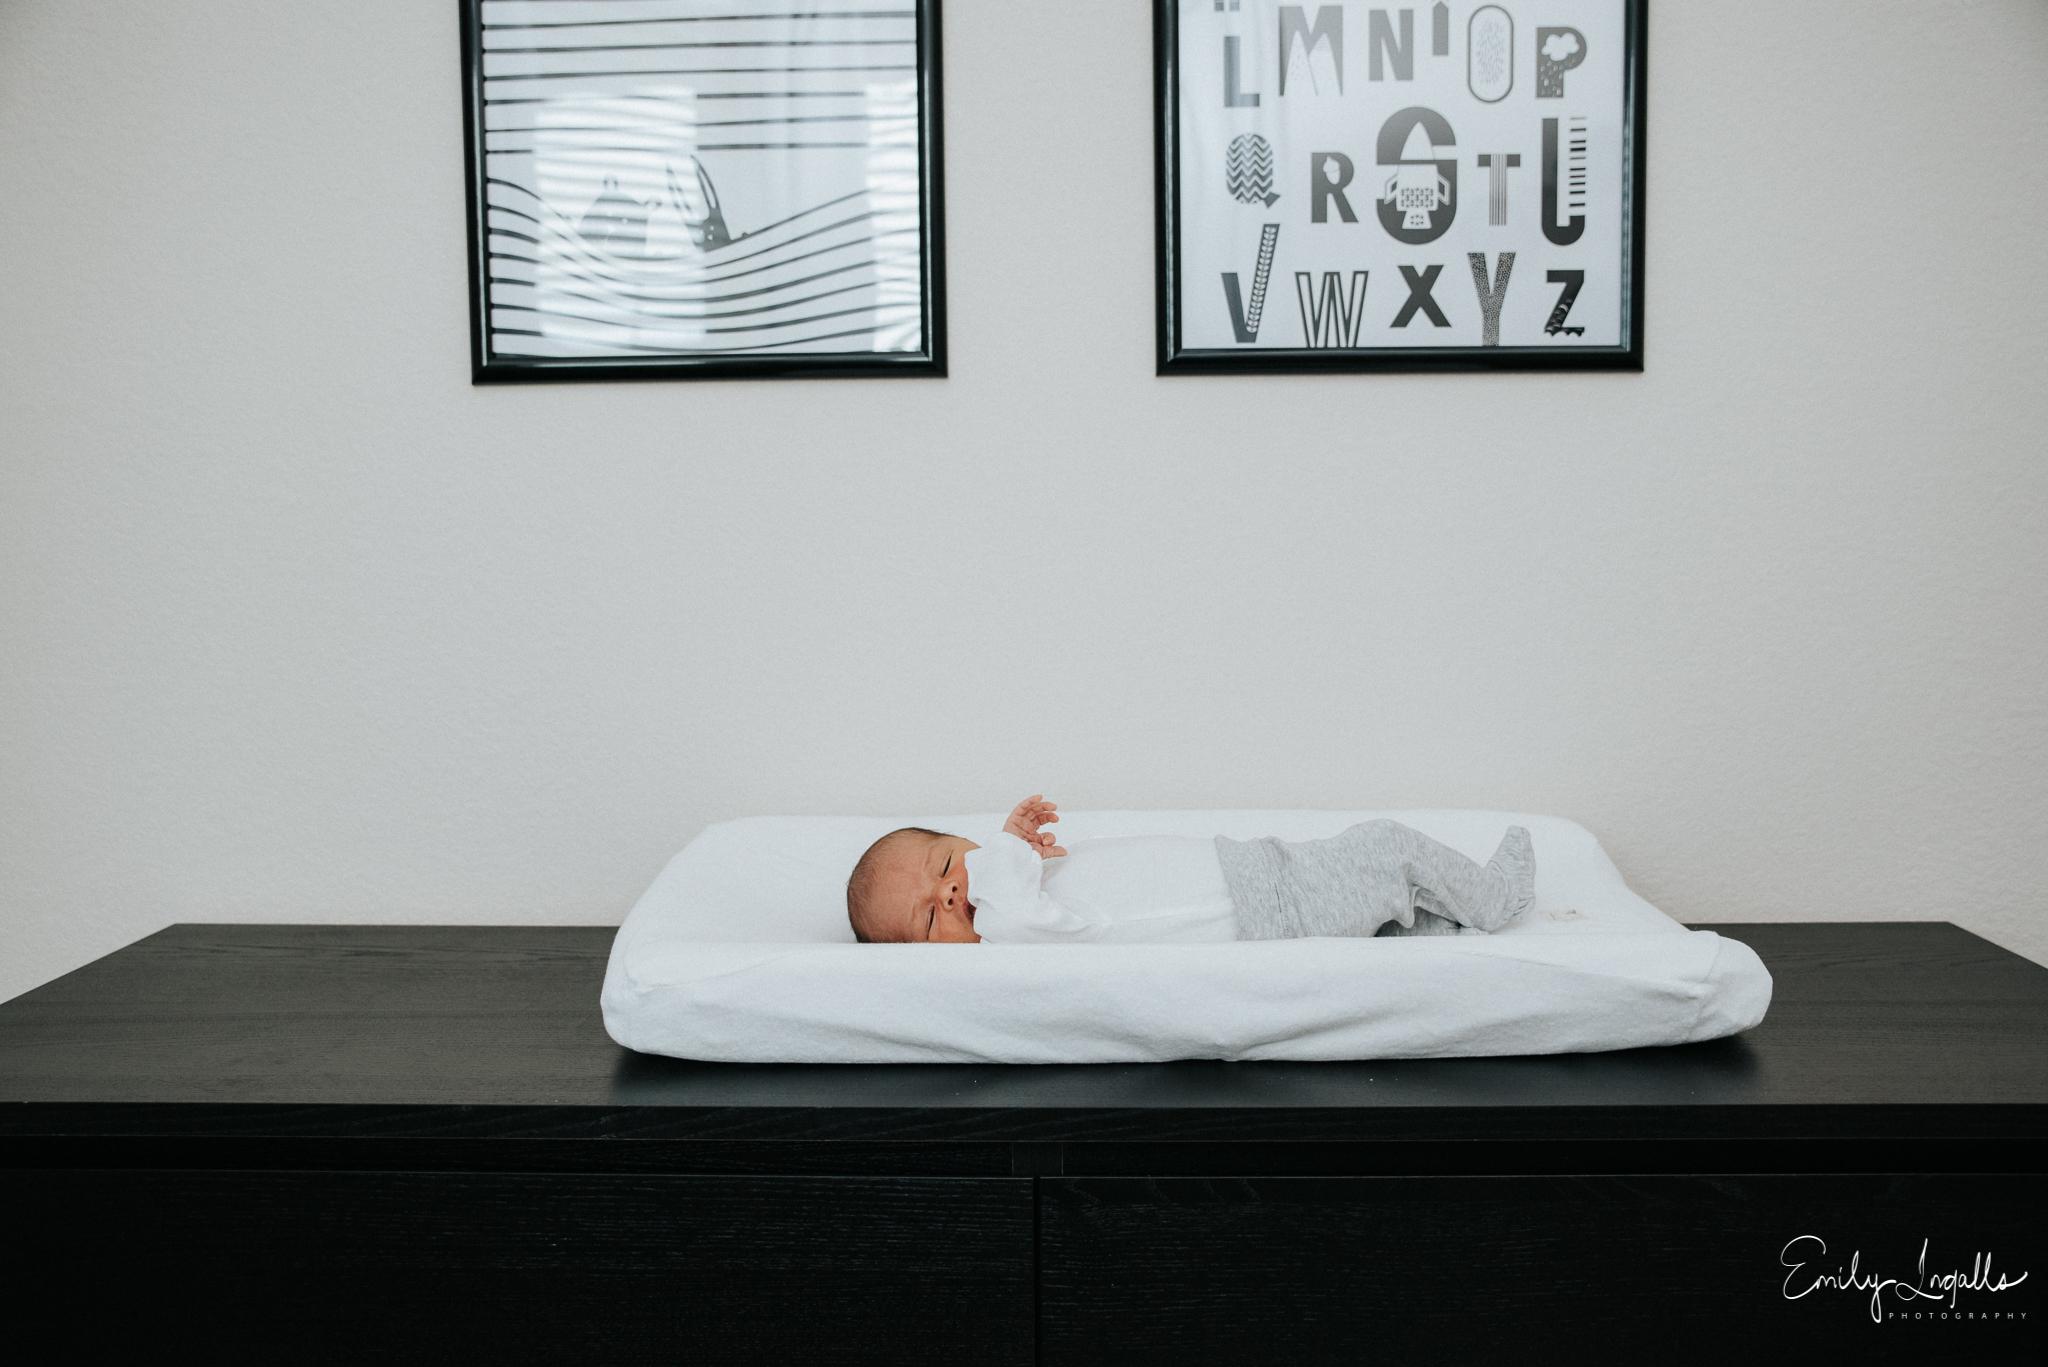 Lifestyle Newborn Photographer_Newborn Round Rock Photographer_Emily Ingalls Photography_Newborn Austin Photographer_Pflugerville Photographer_Georgetown Photographer-11.jpg